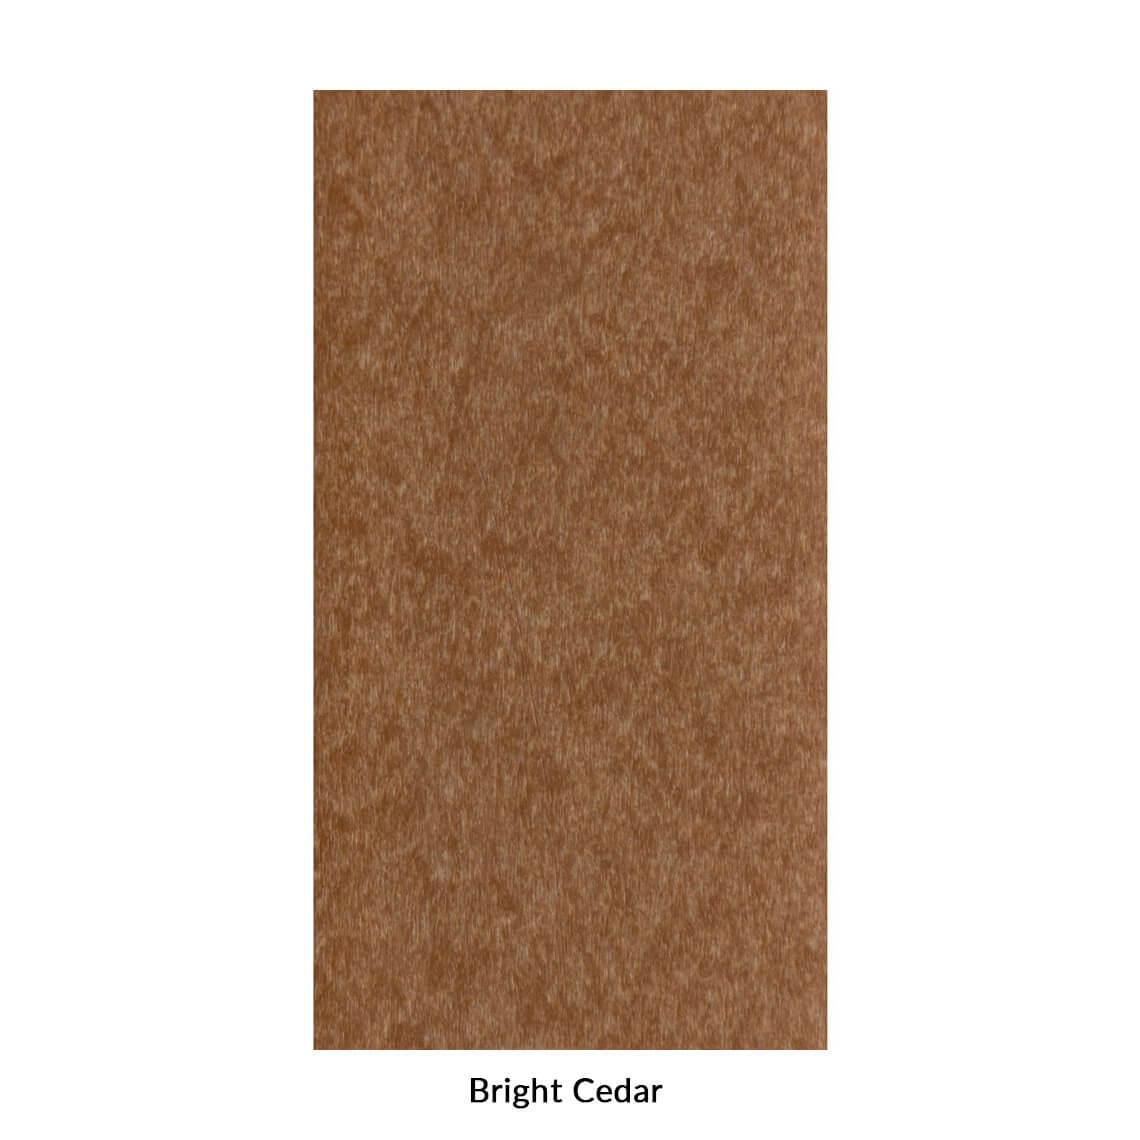 8.-bright-cedar.jpg